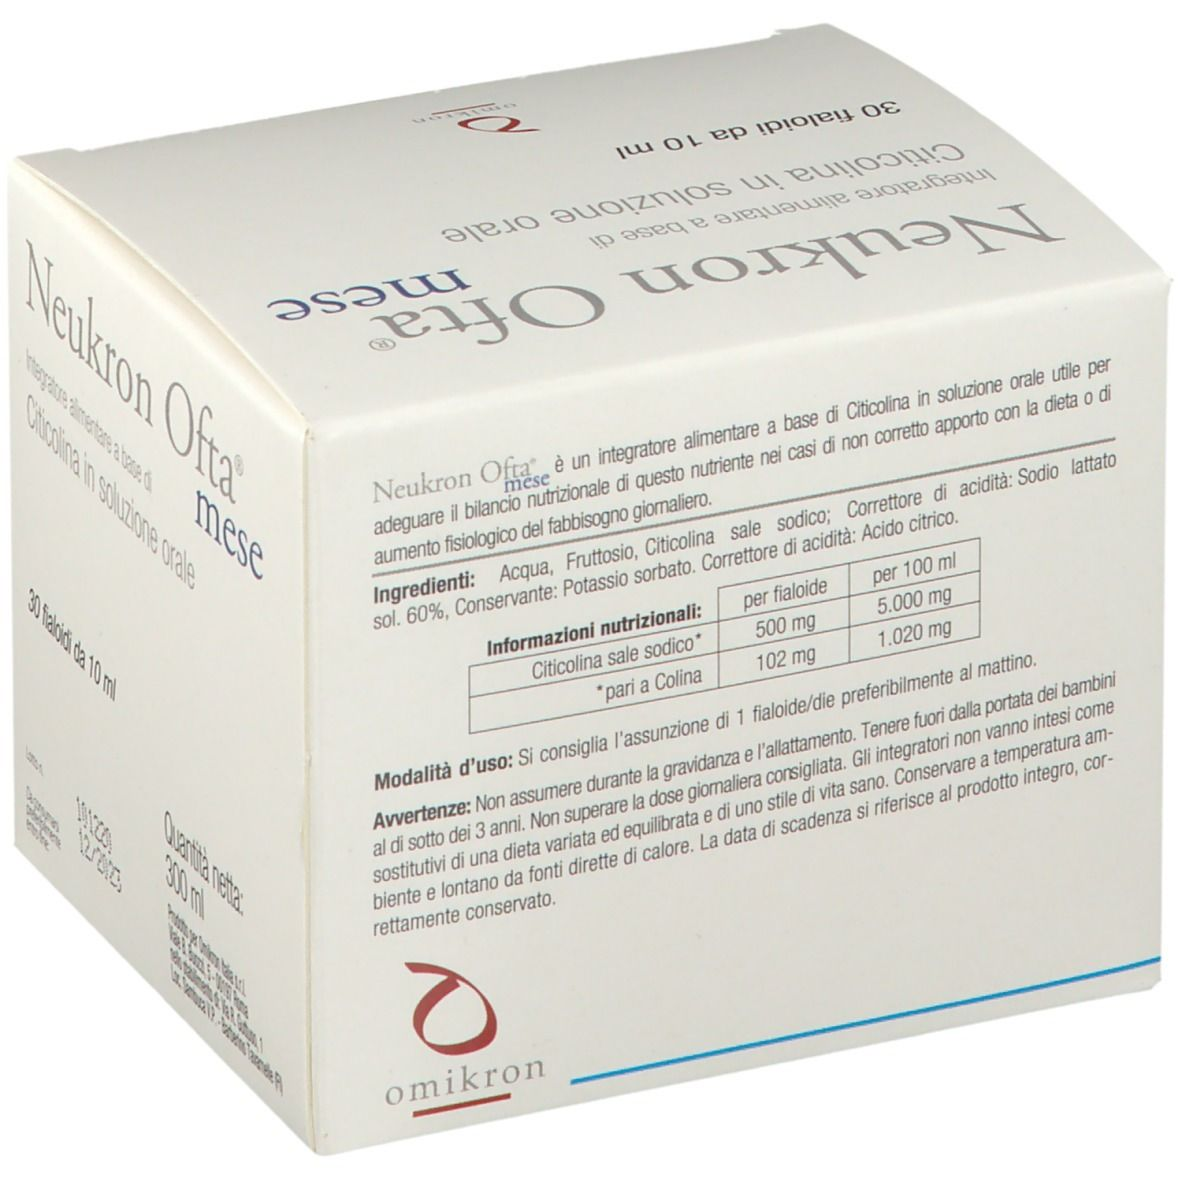 Neukron Ofta Mese 30x10 Ml Shop Farmacia It